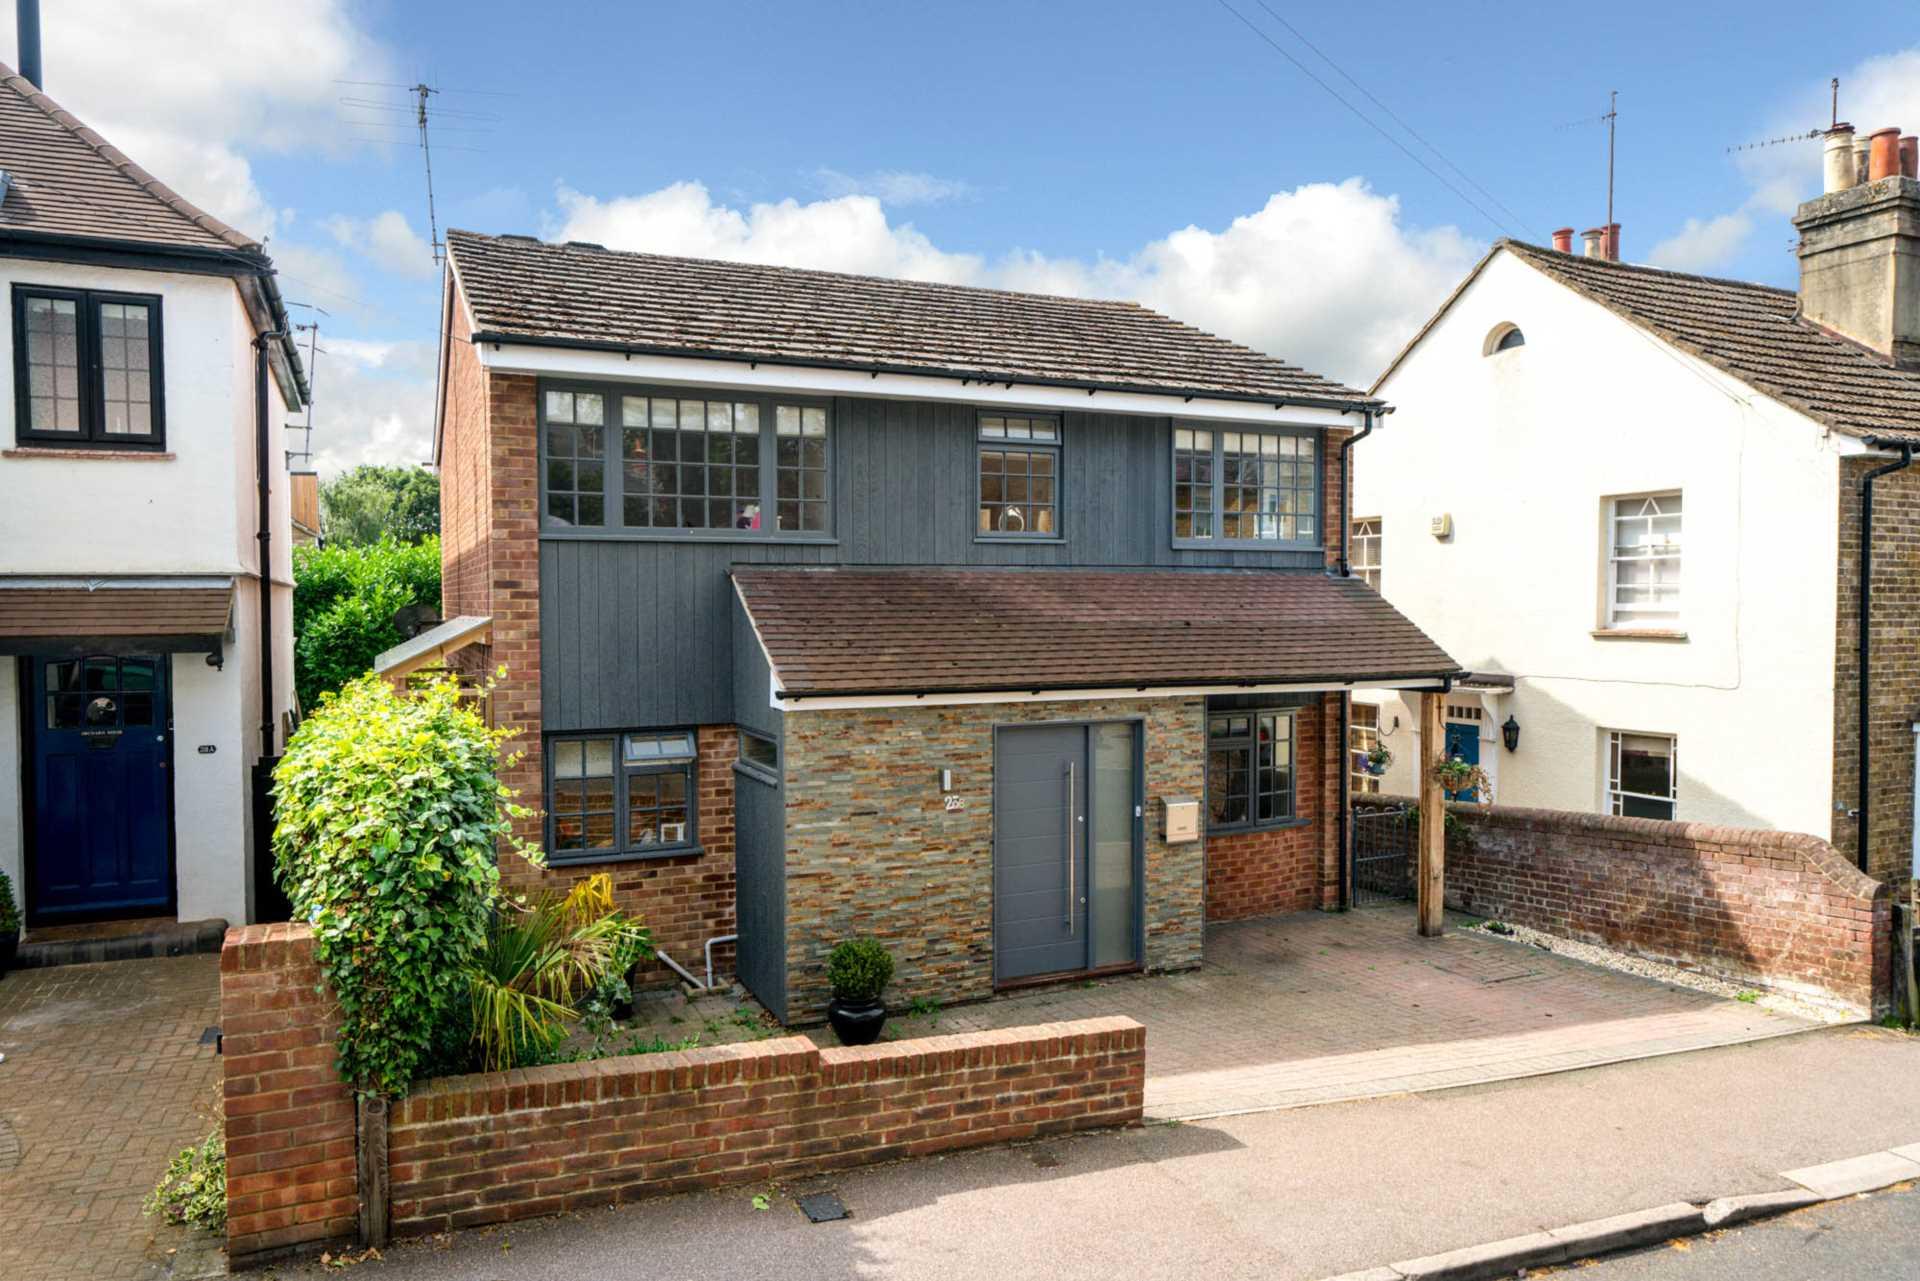 4 bed Detached House for rent in Hemel Hempstead. From David Doyle (Boxmoor/Hemel Hempstead)